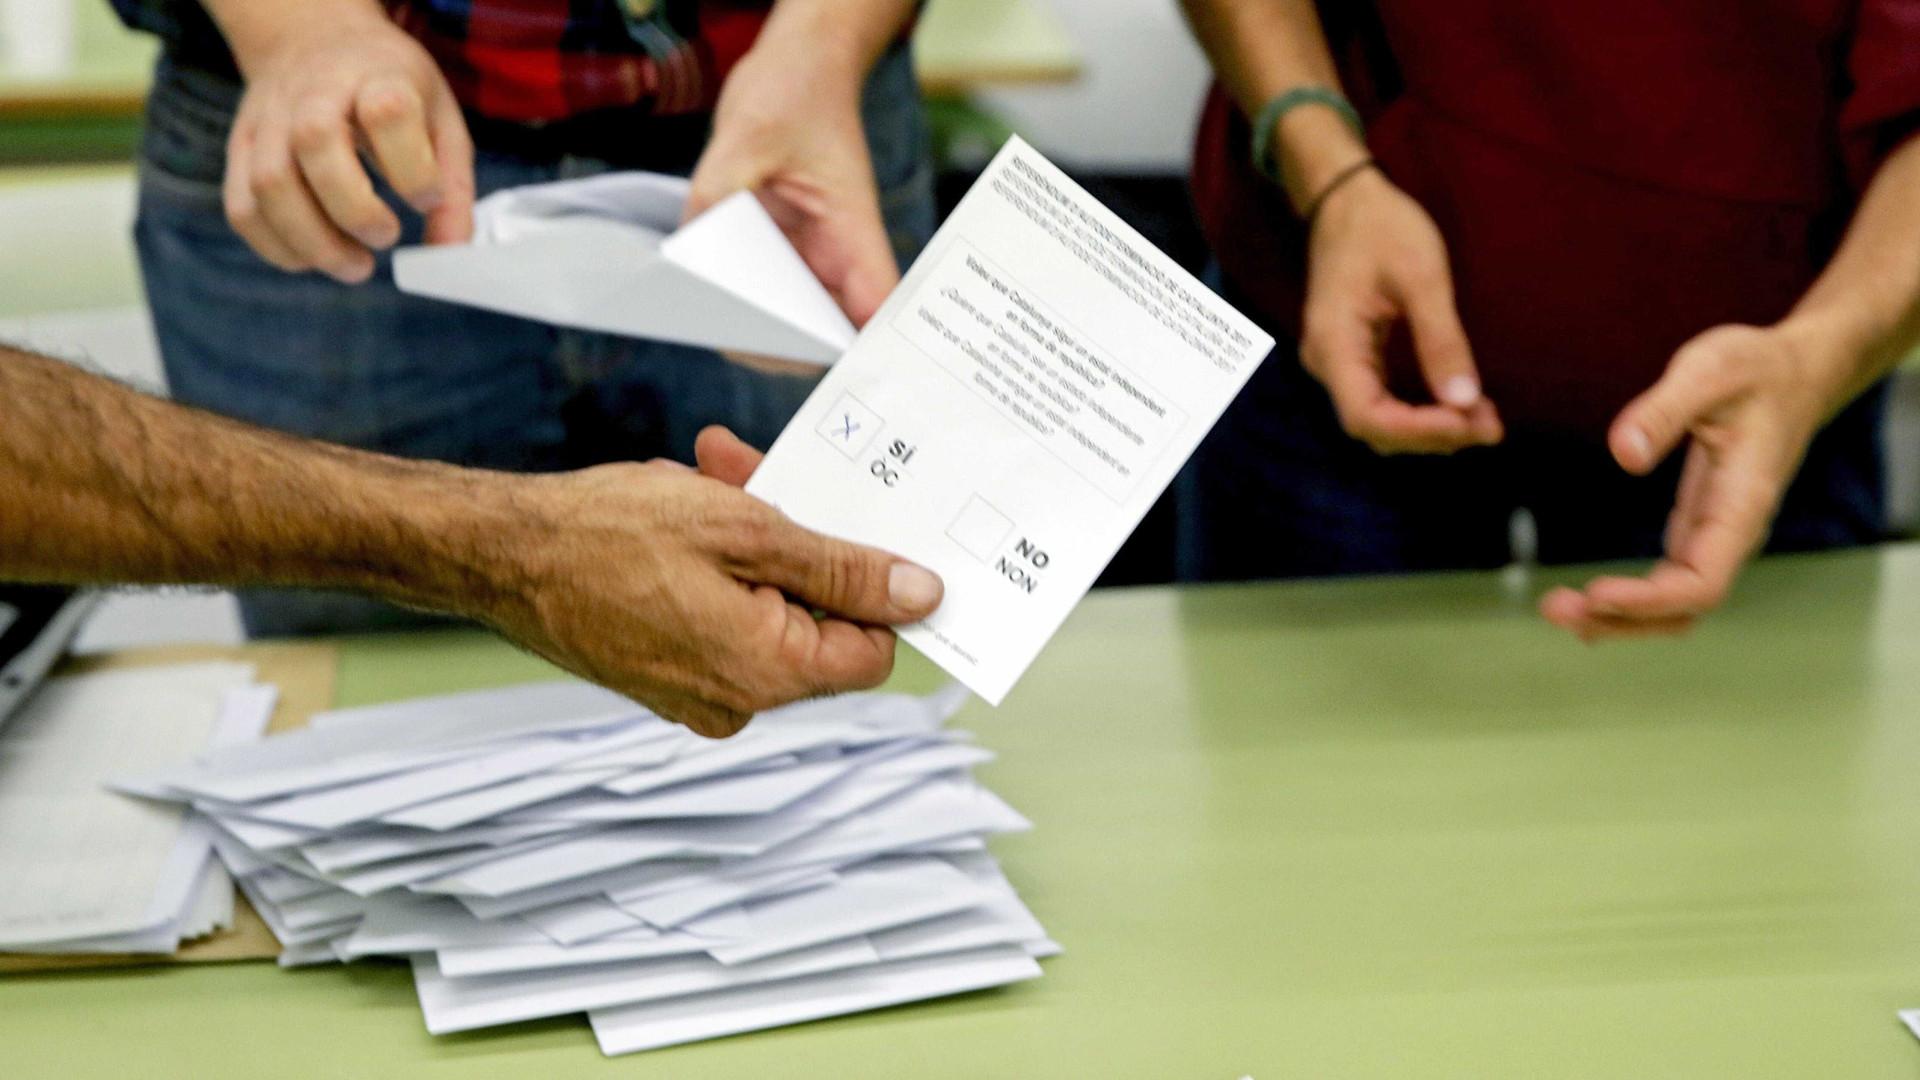 Catalunha: Lei que sustentou referendo considerada inconstitucional